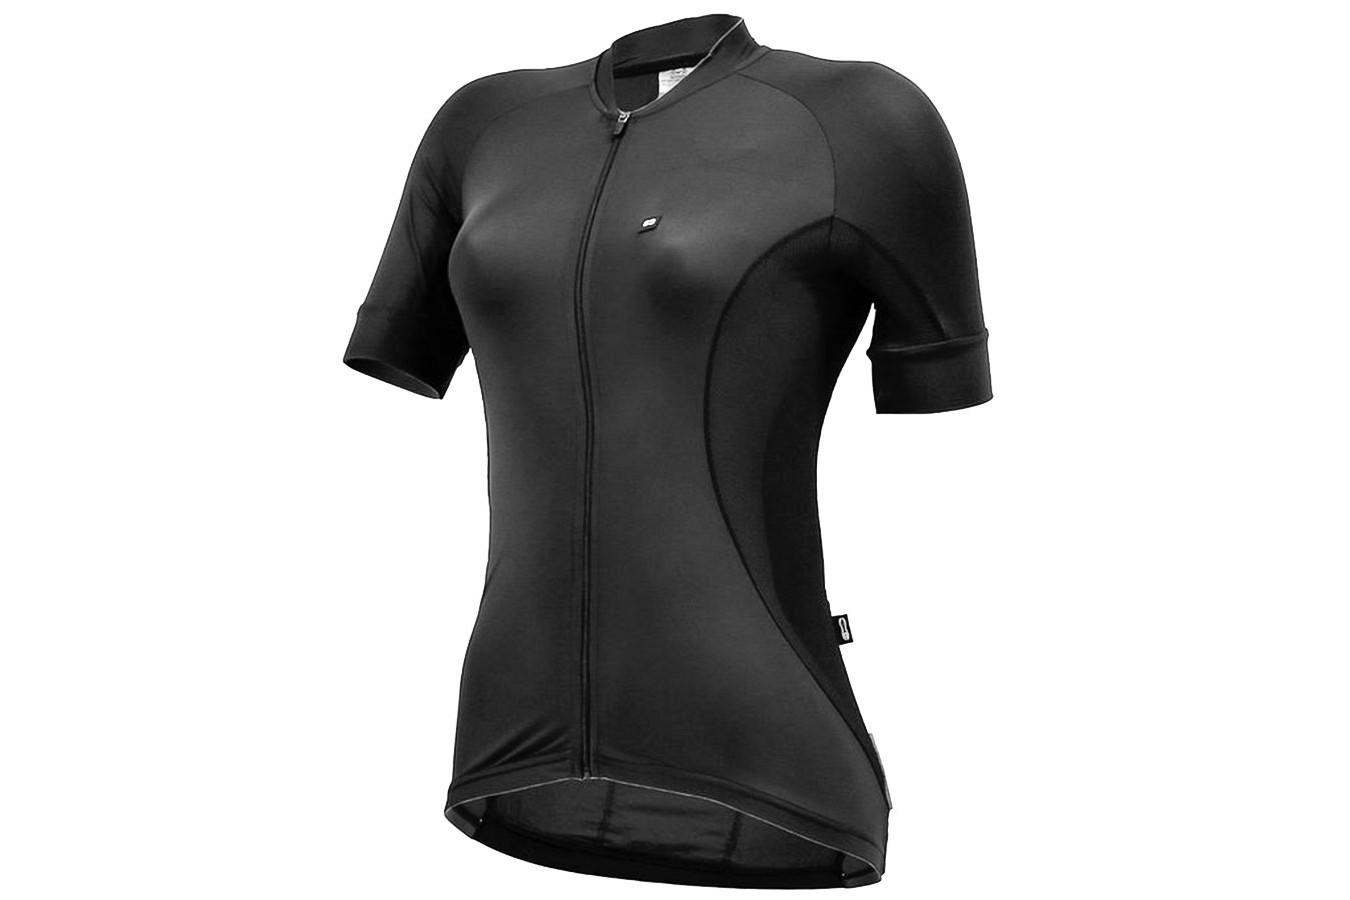 Camisa para Ciclista Feminina Ellegance All Black - Márcio May